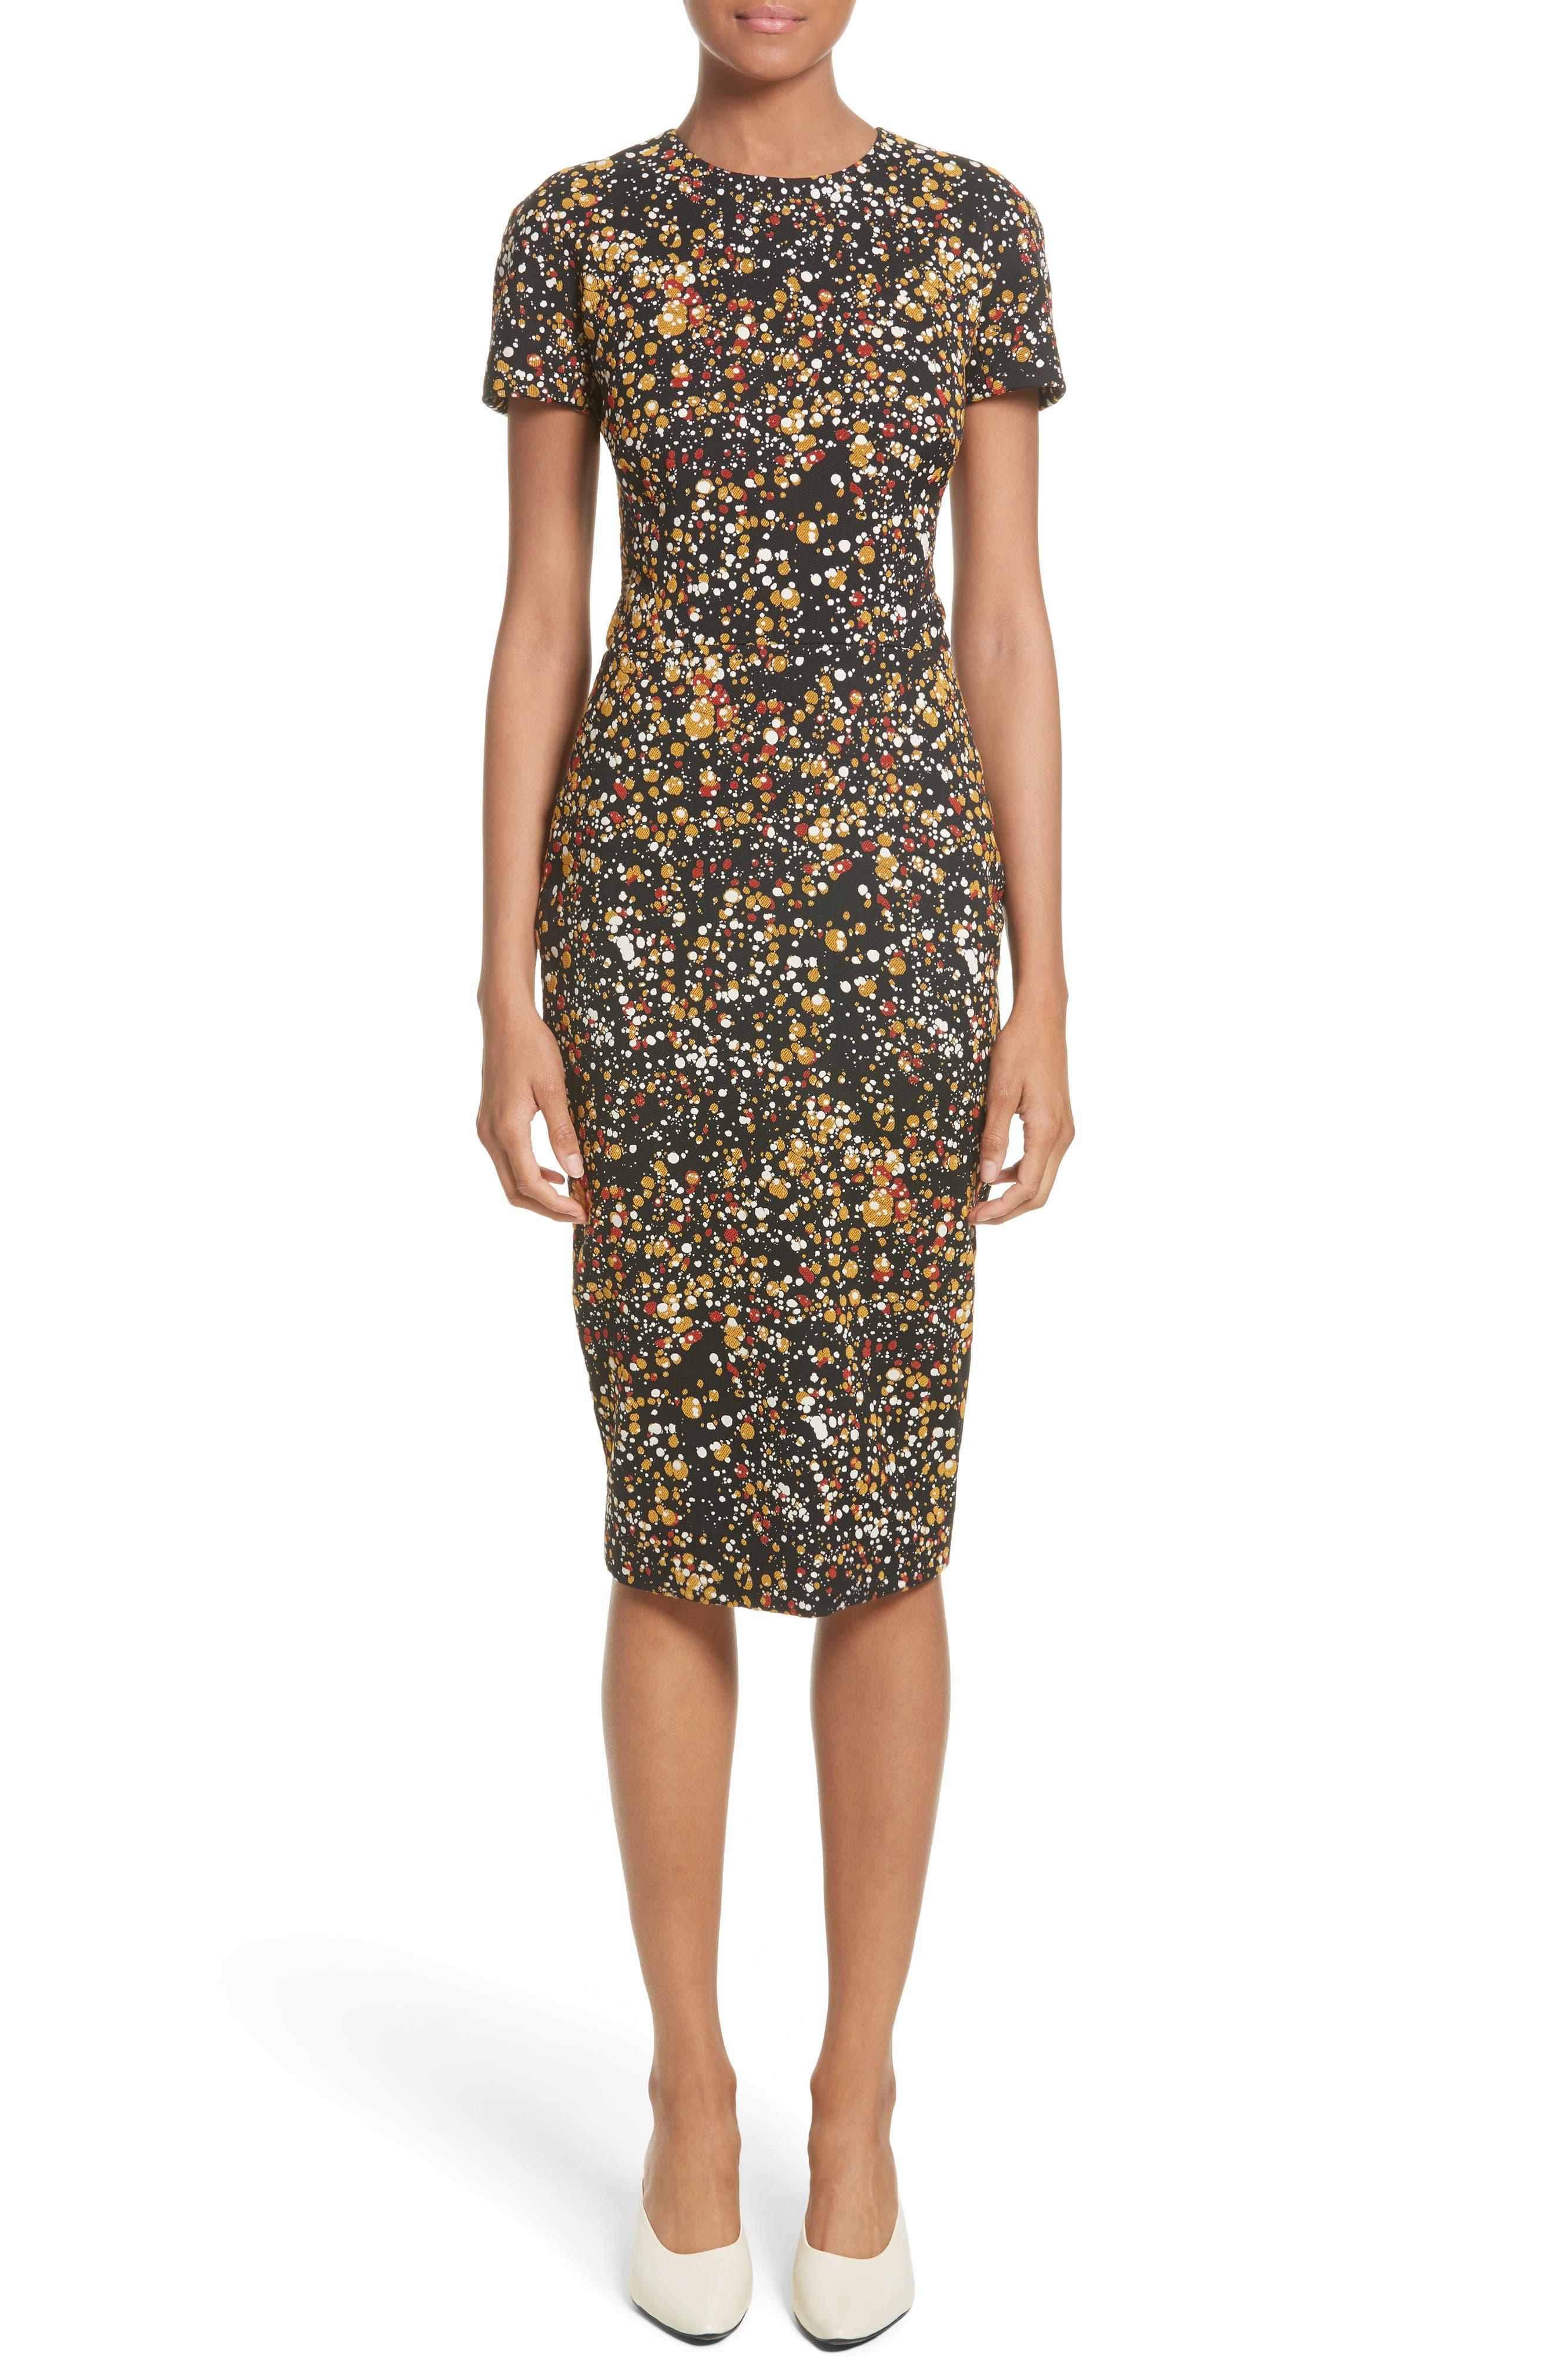 Victoria Beckham Marble Jacquard Dress